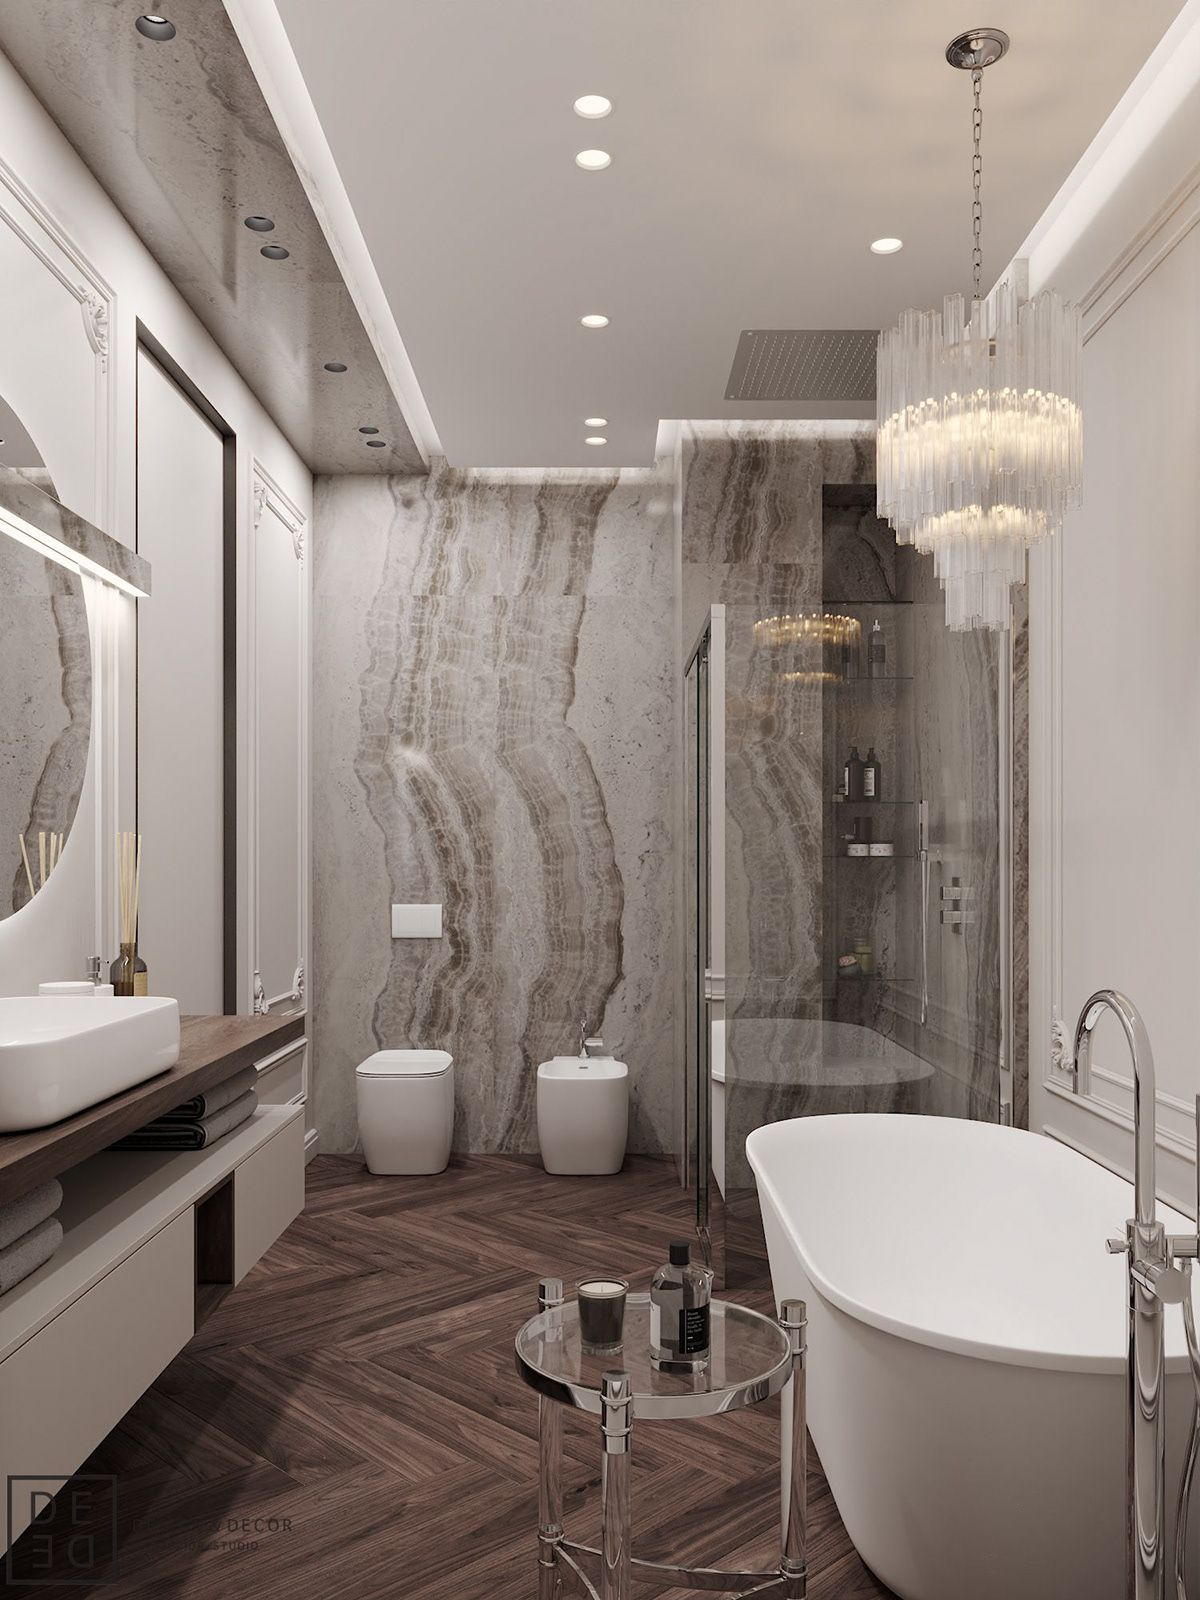 De De Blueberry Flat On Behance Housewashroomdesign Bathroom Design Luxury Bathroom Design Small Bathroom Interior Design New classic bathroom design